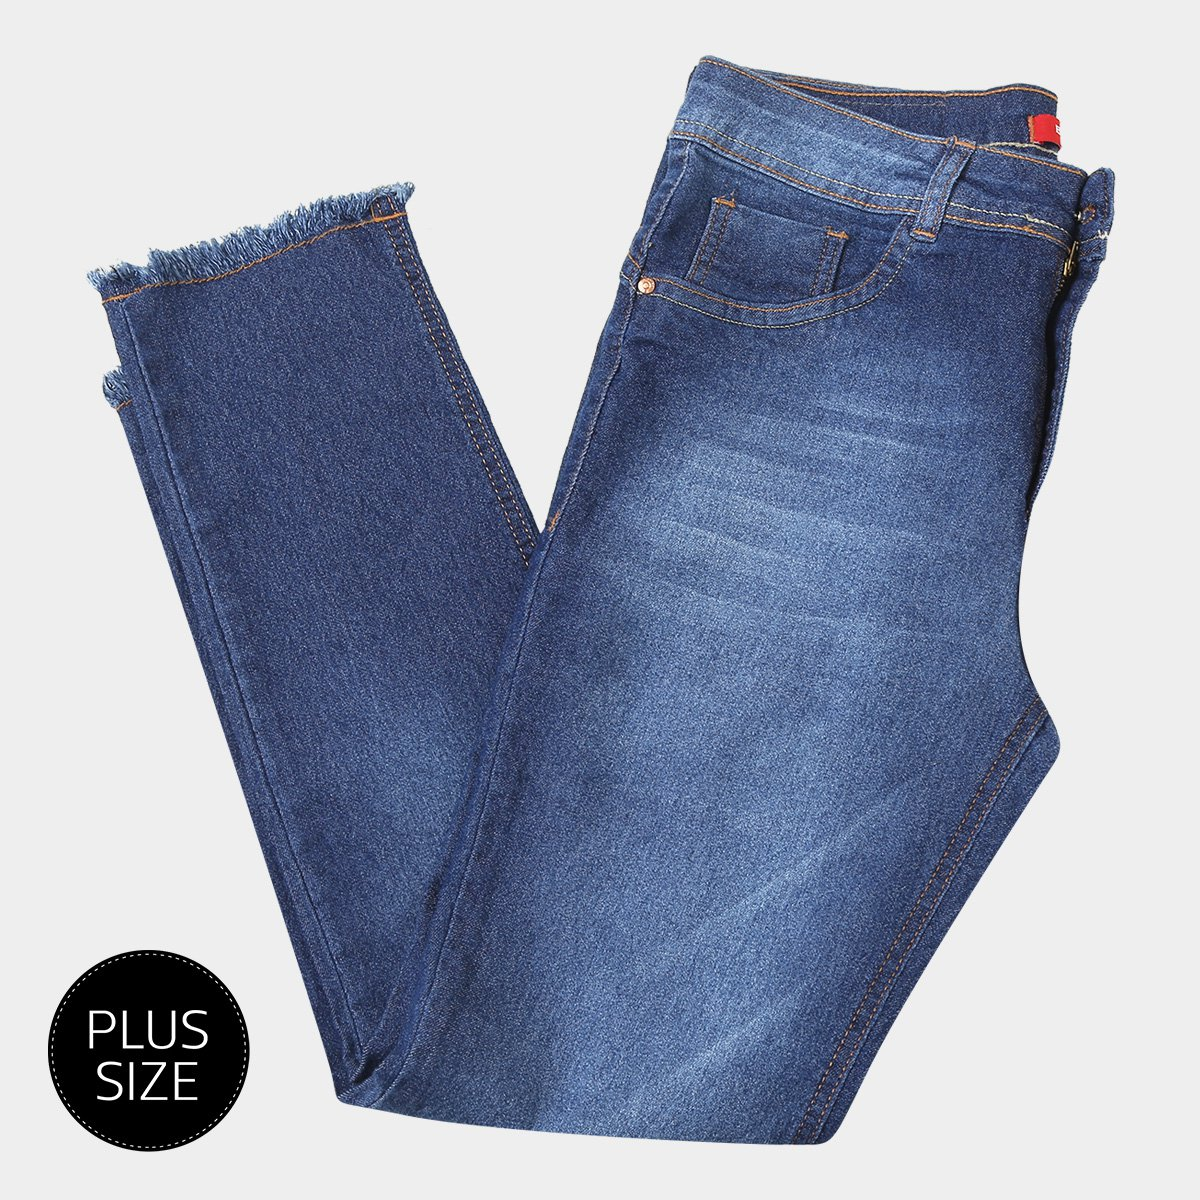 88d0381bb Calça Jeans Biotipo Midi Alice Barra Desfiada Plus Size Feminina